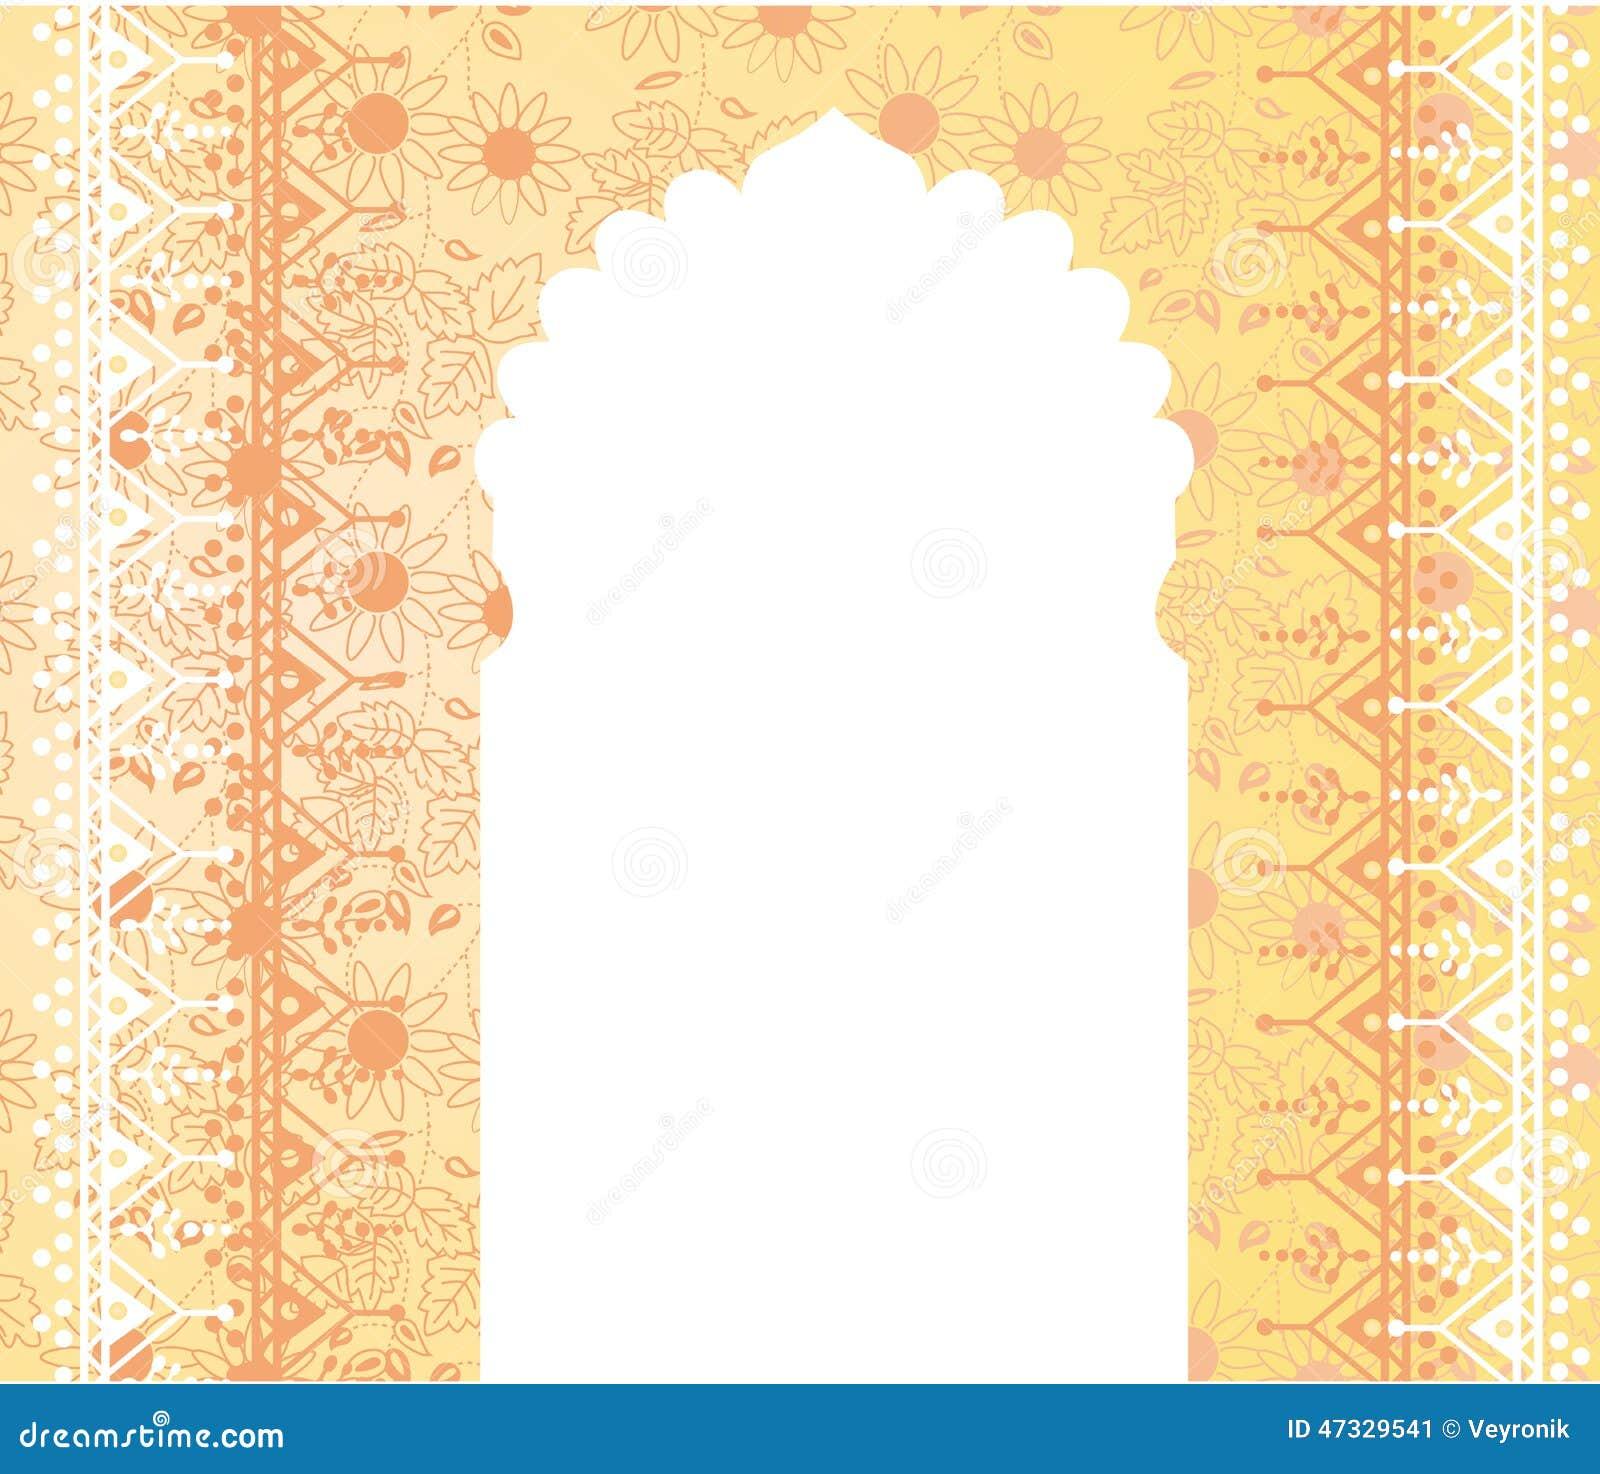 Oriental Temple Gate Floral Banner Design Stock Photo